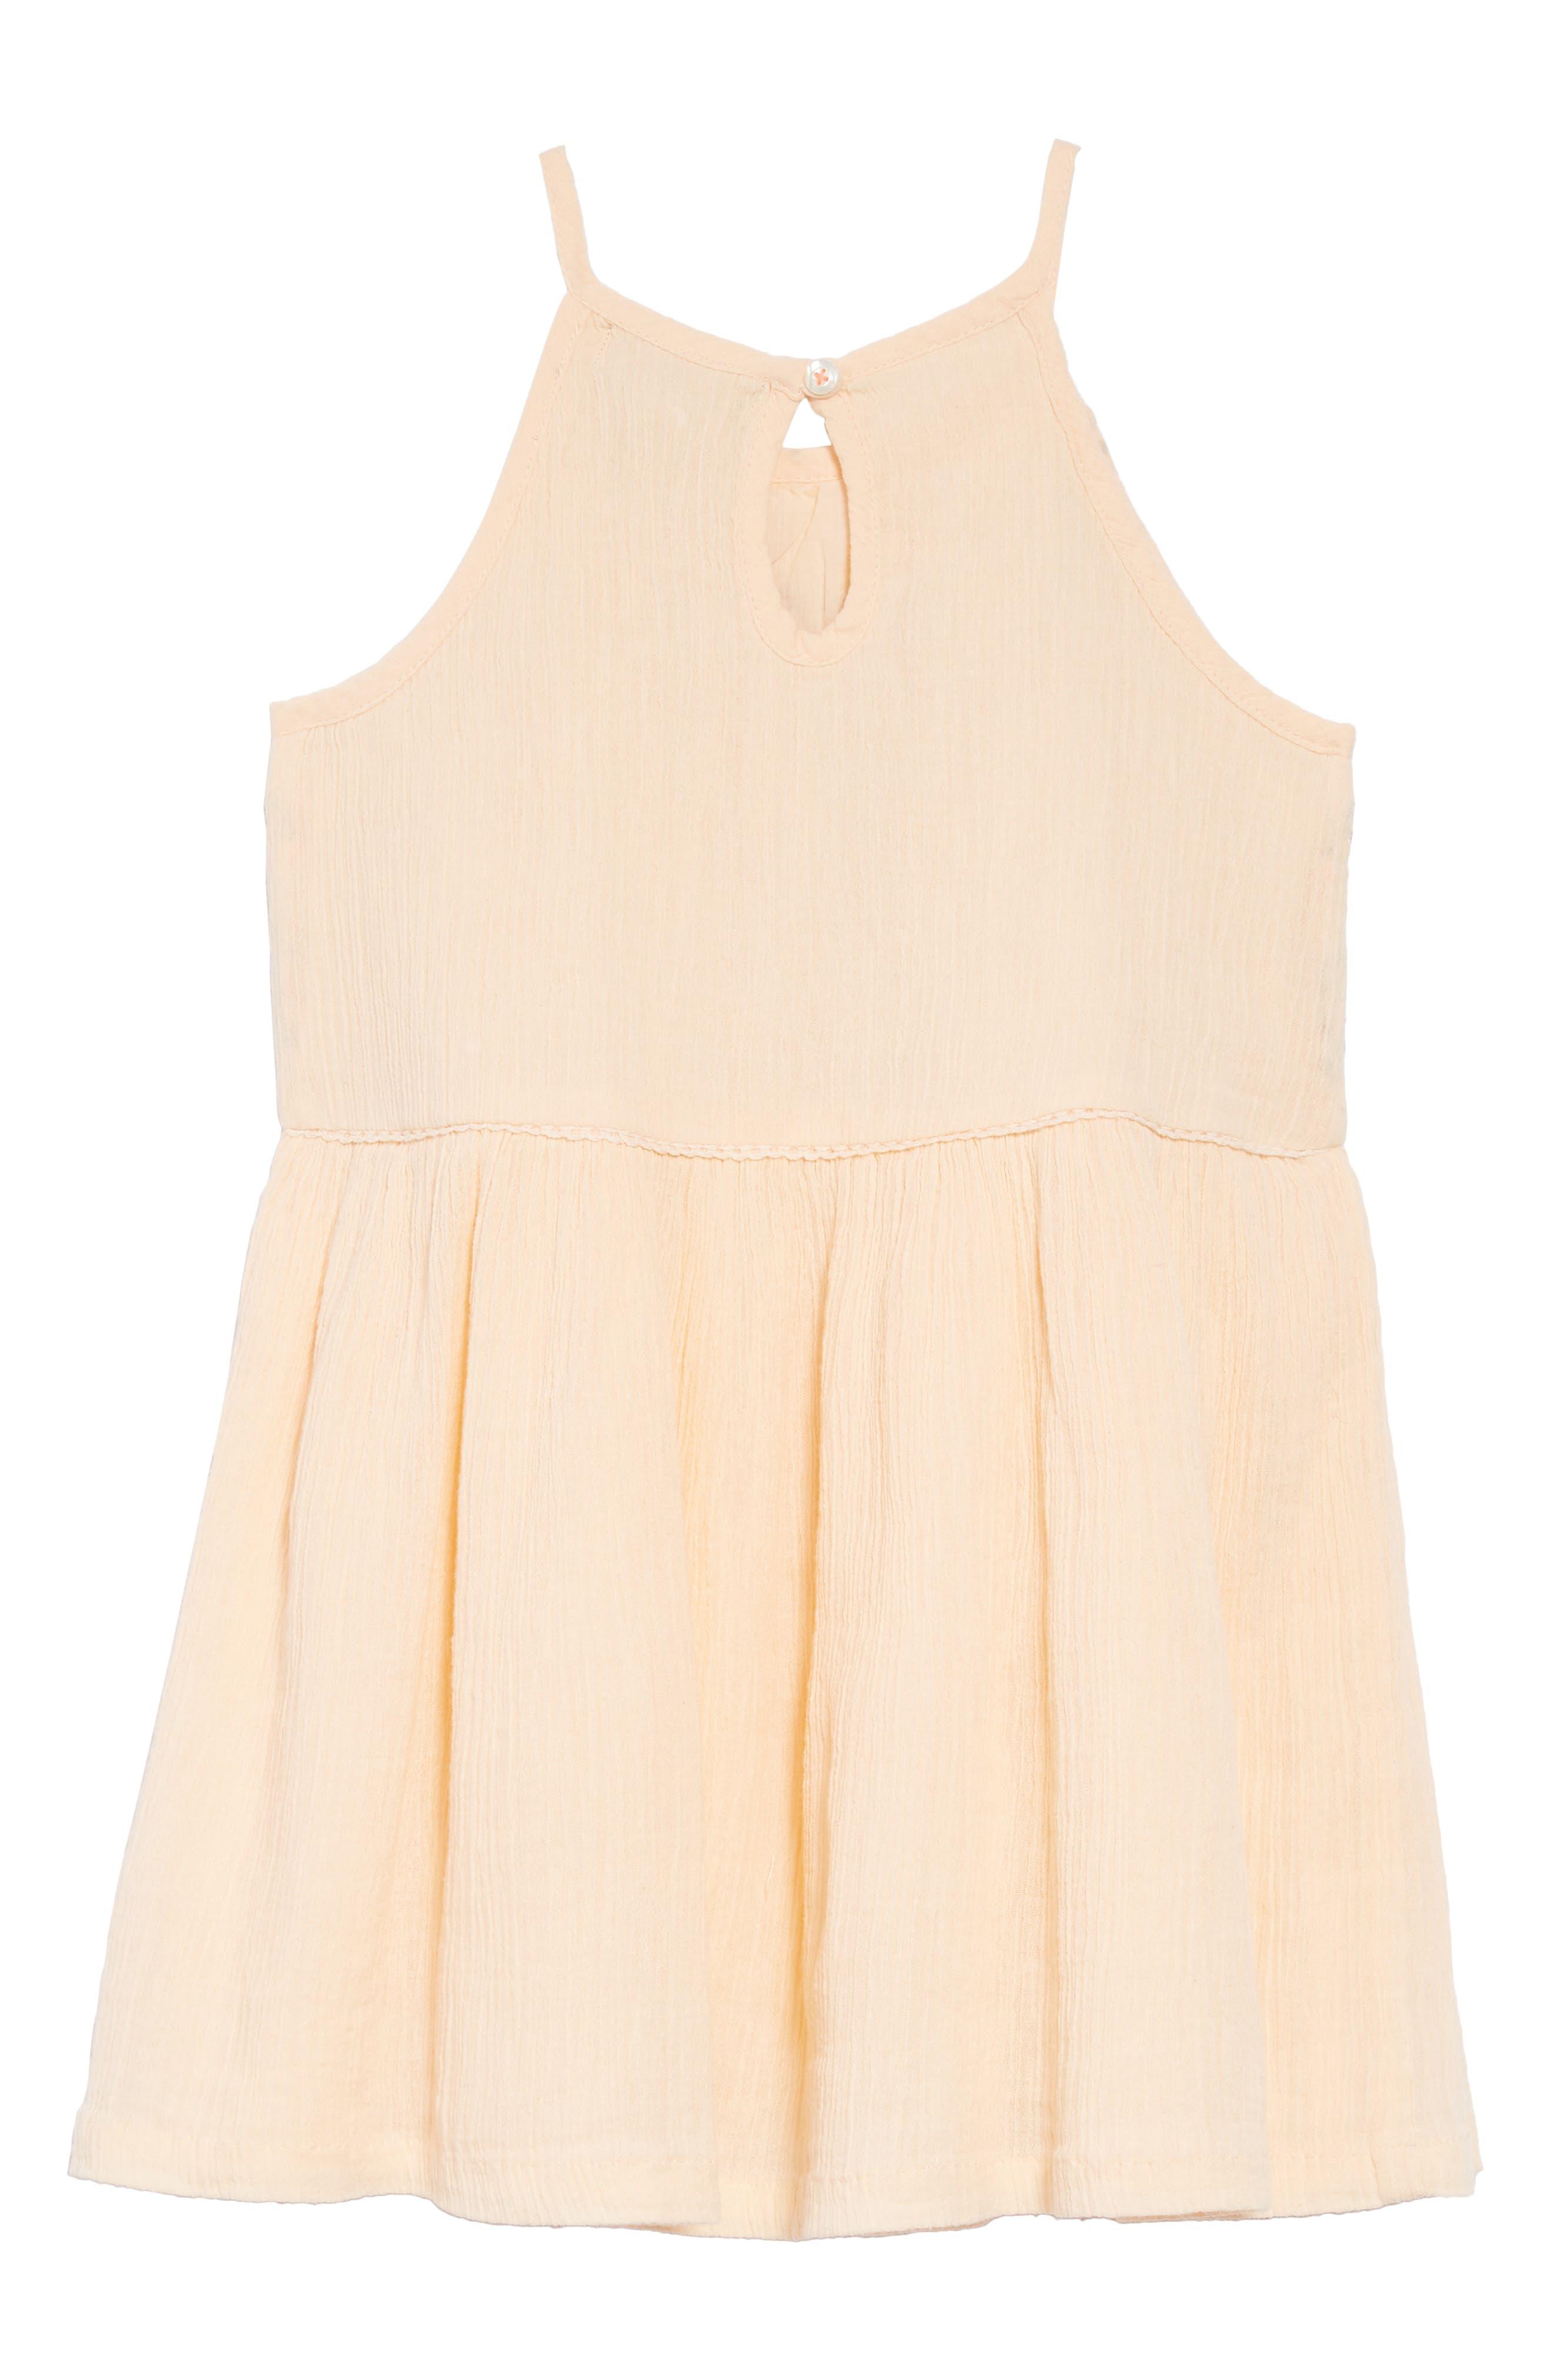 Sofia Embroidered Dress,                             Alternate thumbnail 2, color,